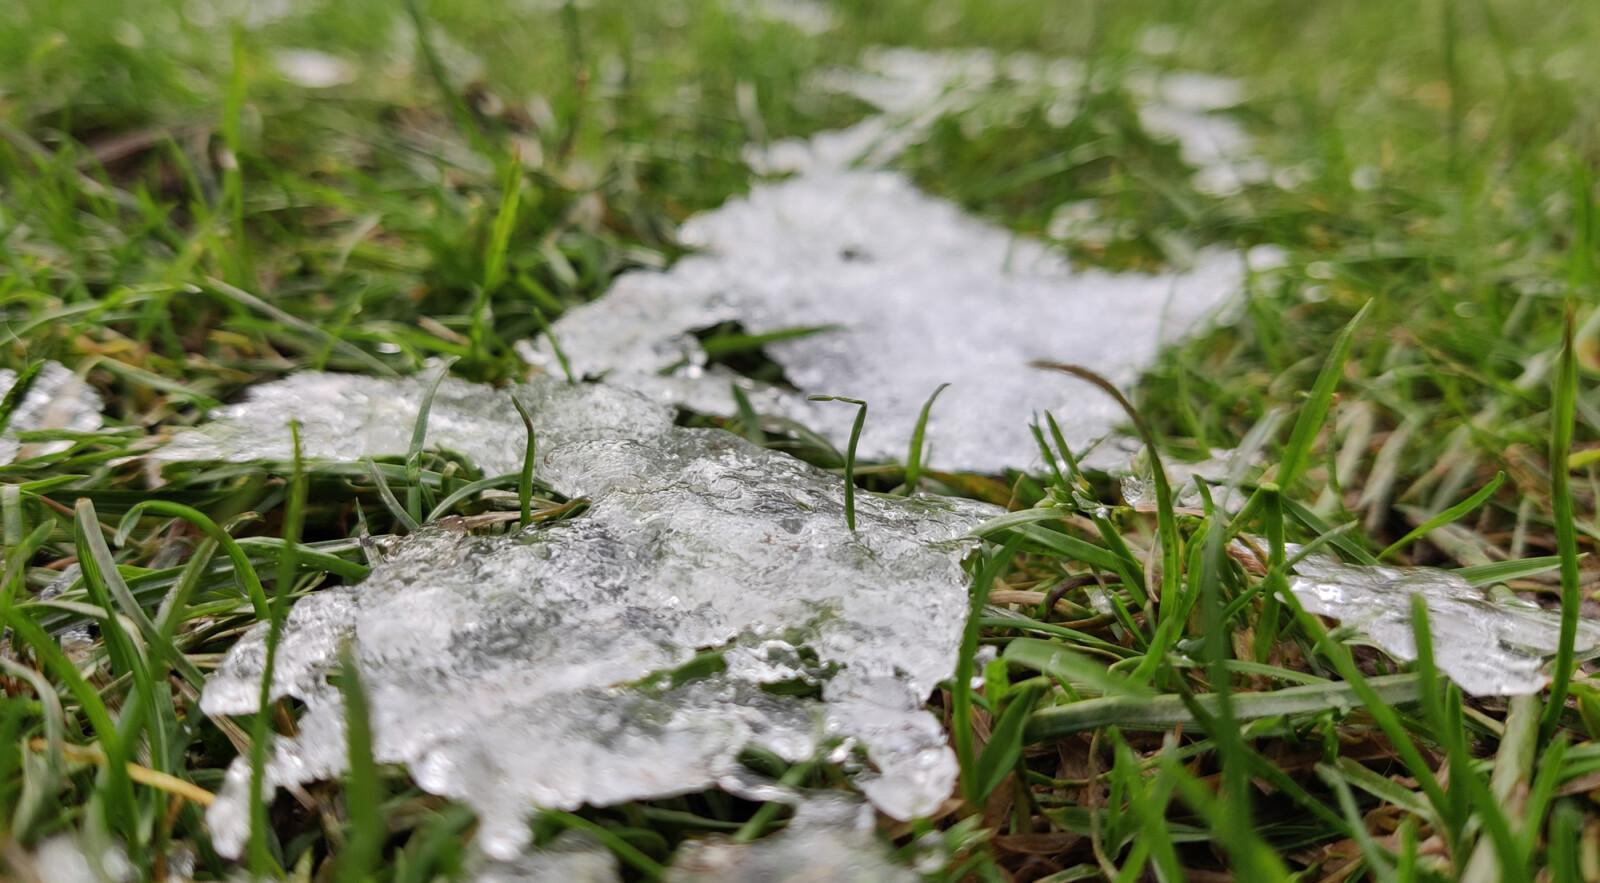 Snow melting on grass